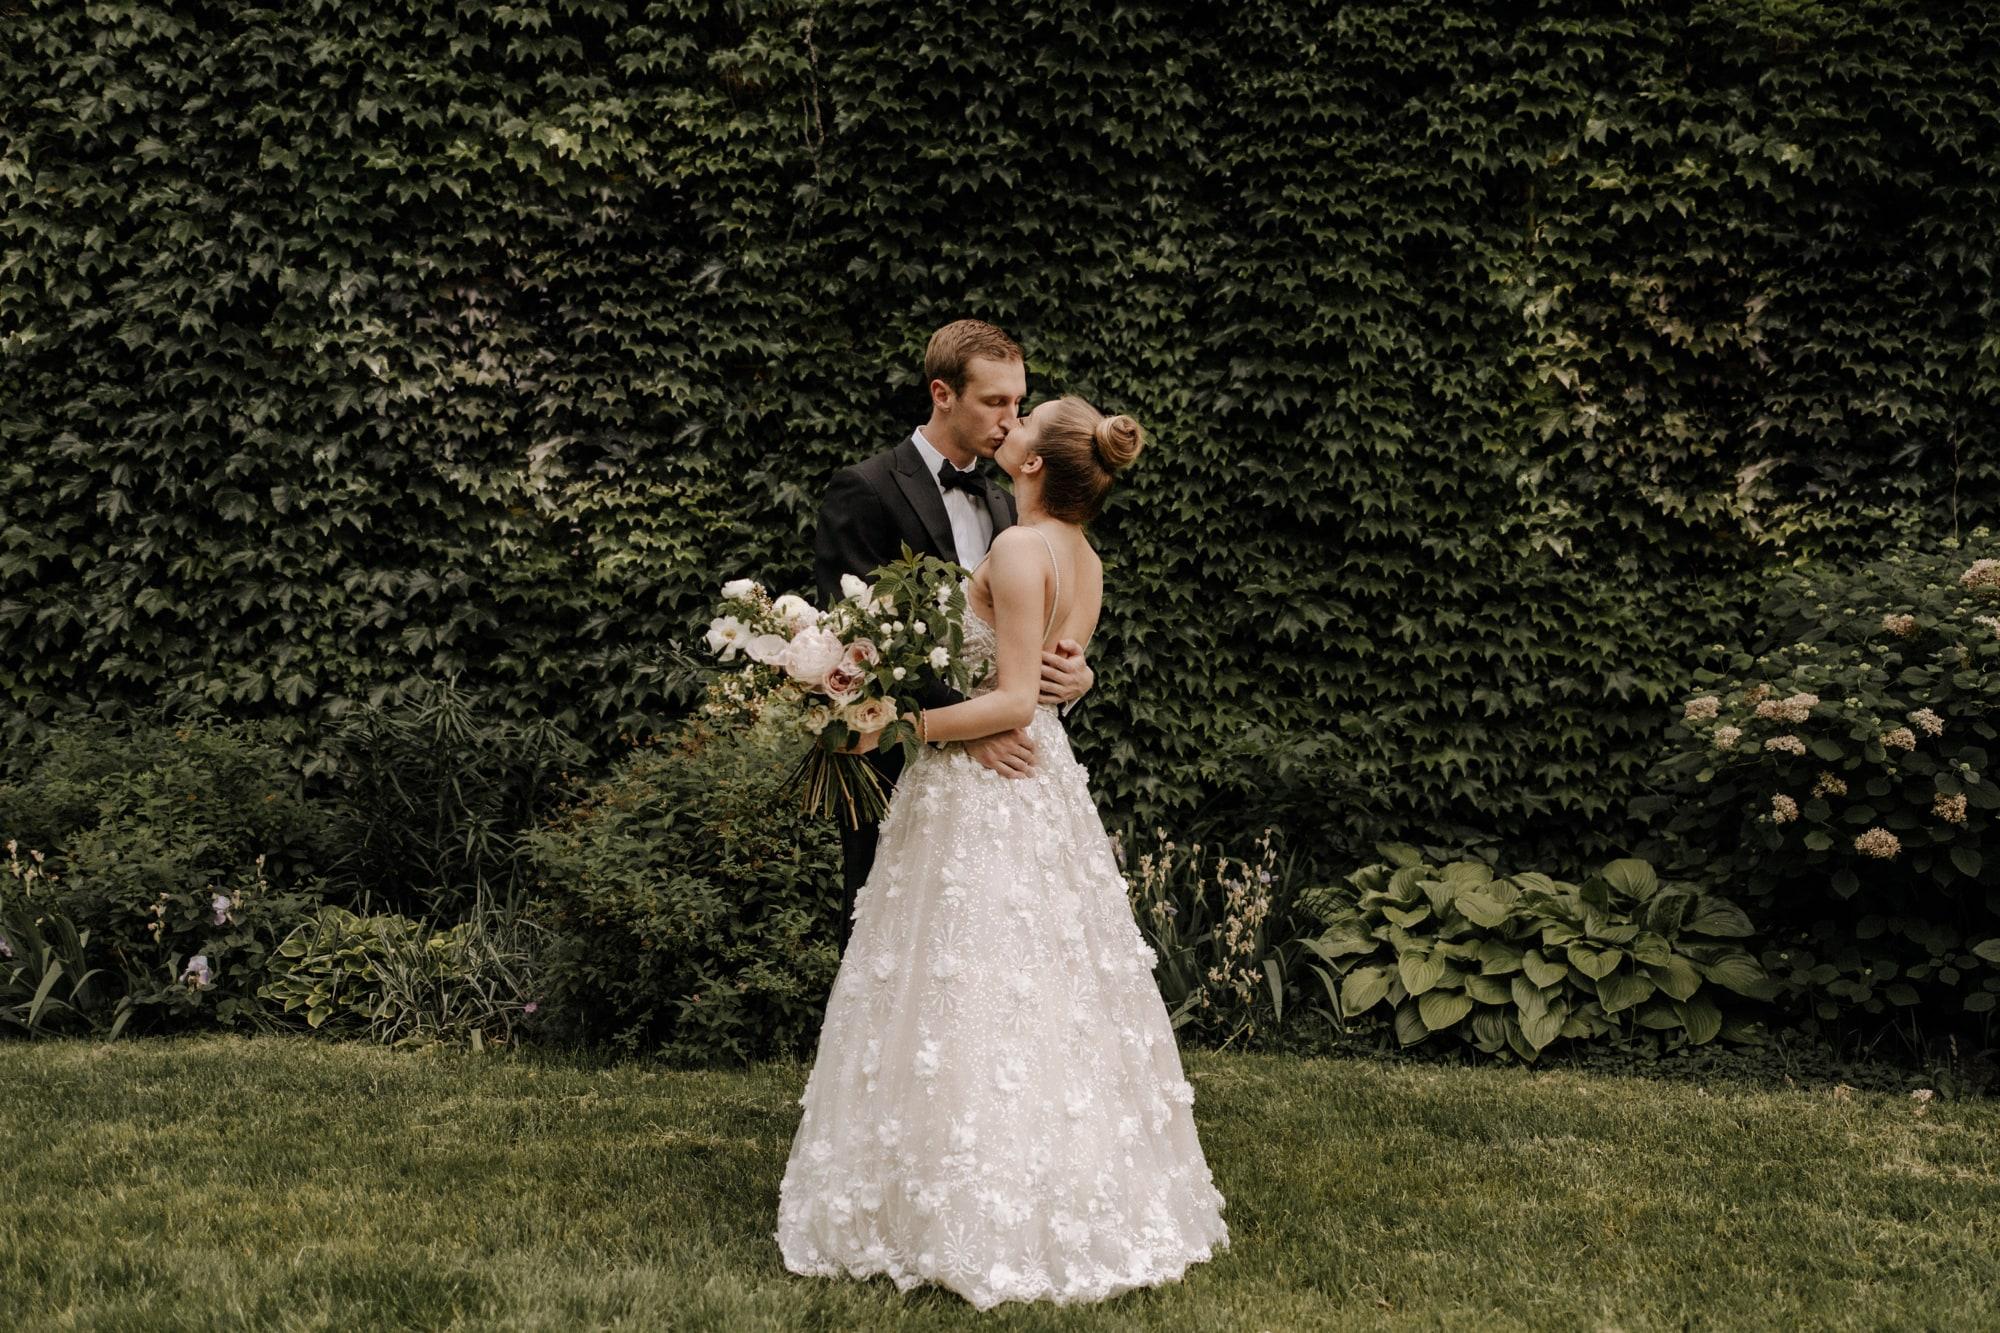 MIA-Minneapolis-Institute-Art-Summer-Wedding-_18.jpg